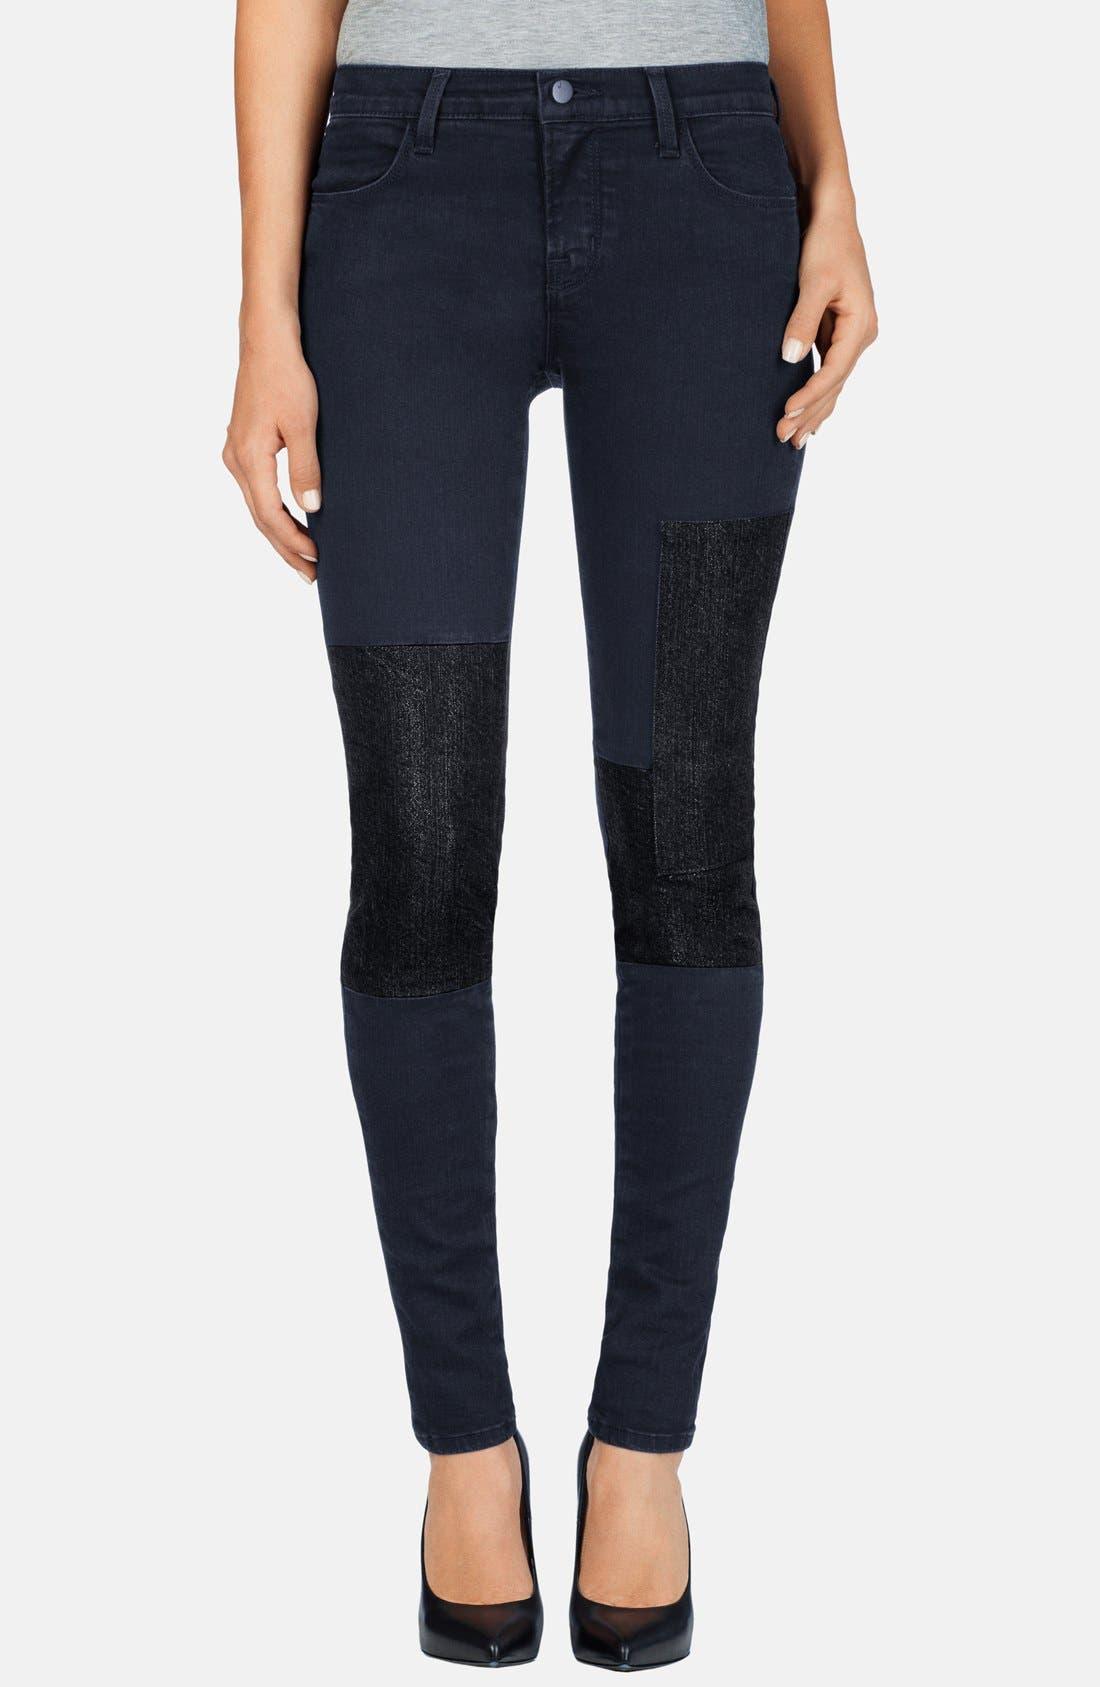 Alternate Image 1 Selected - J Brand 'Nova' Paneled Skinny Jeans (Bluebird)